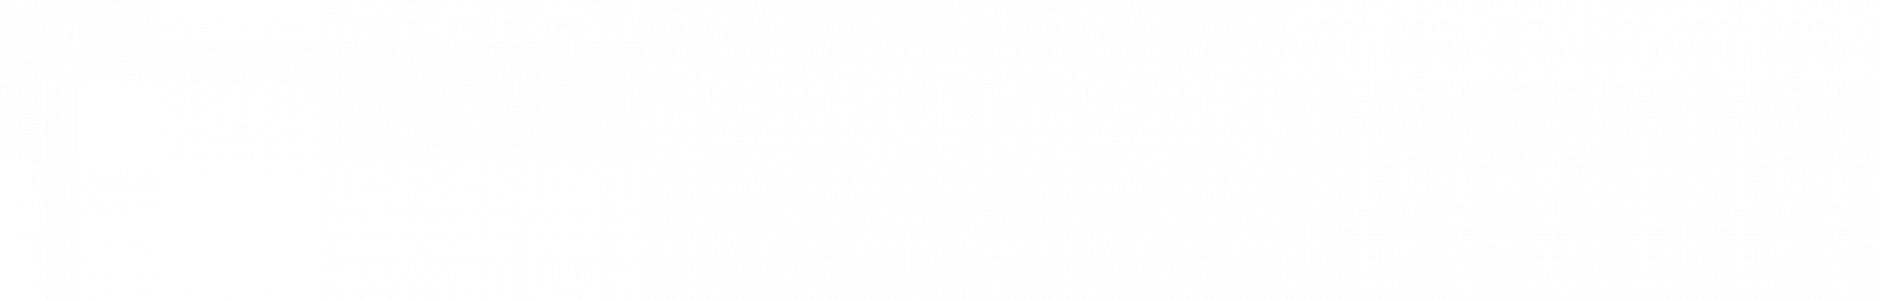 moxa-mpc-2121-series-image-4-1